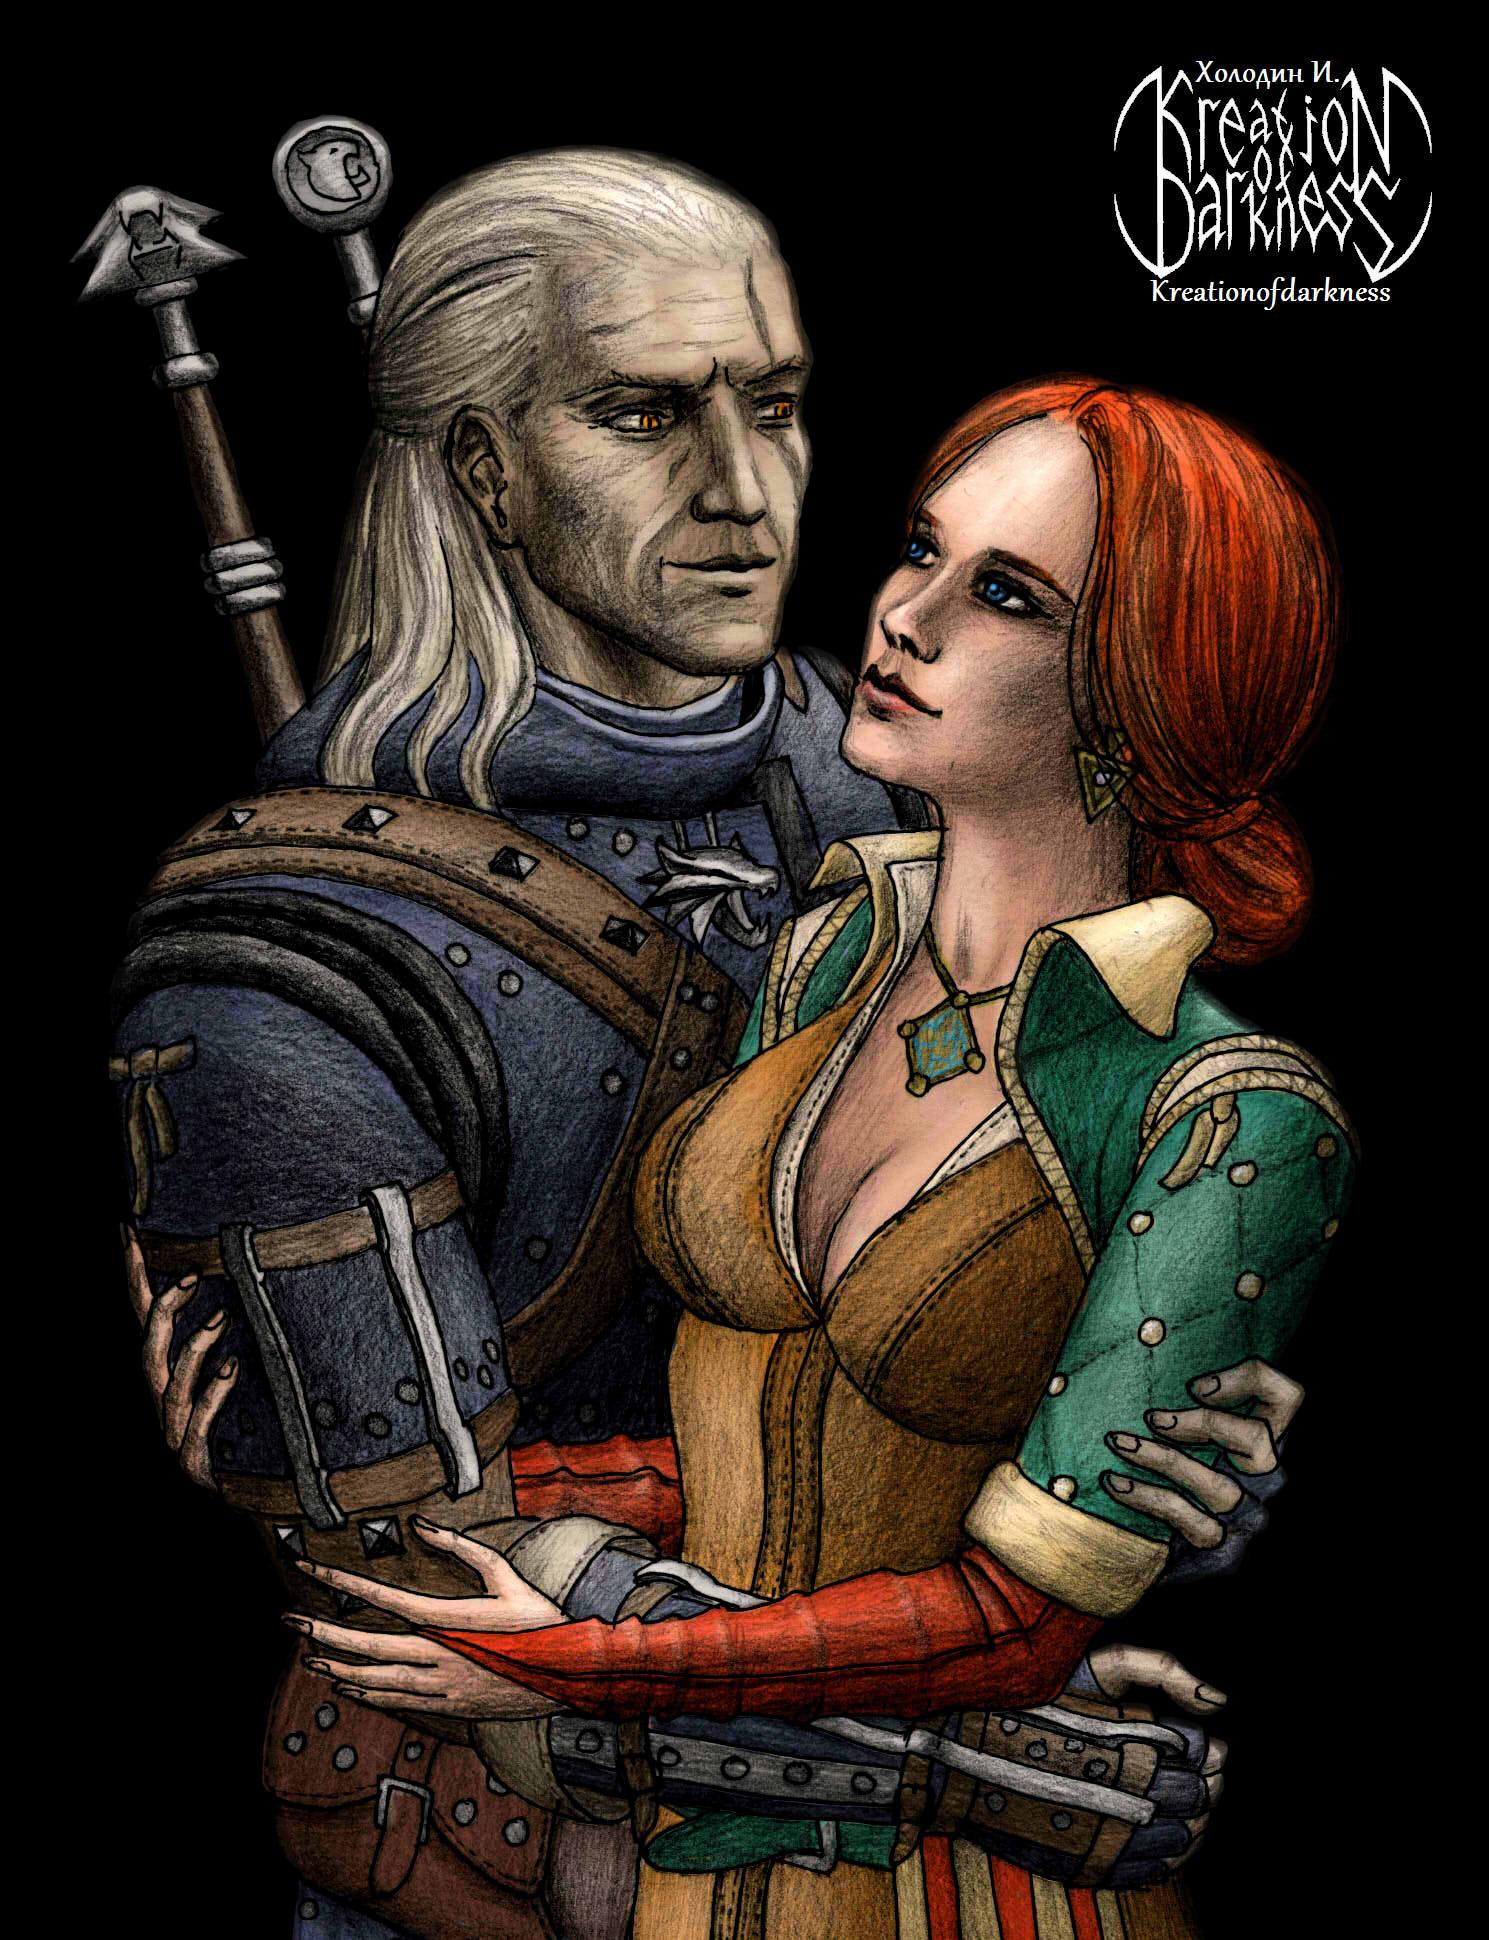 Ведьмак и чародейка - Witcher 3: Wild Hunt, the Арт, Трисс